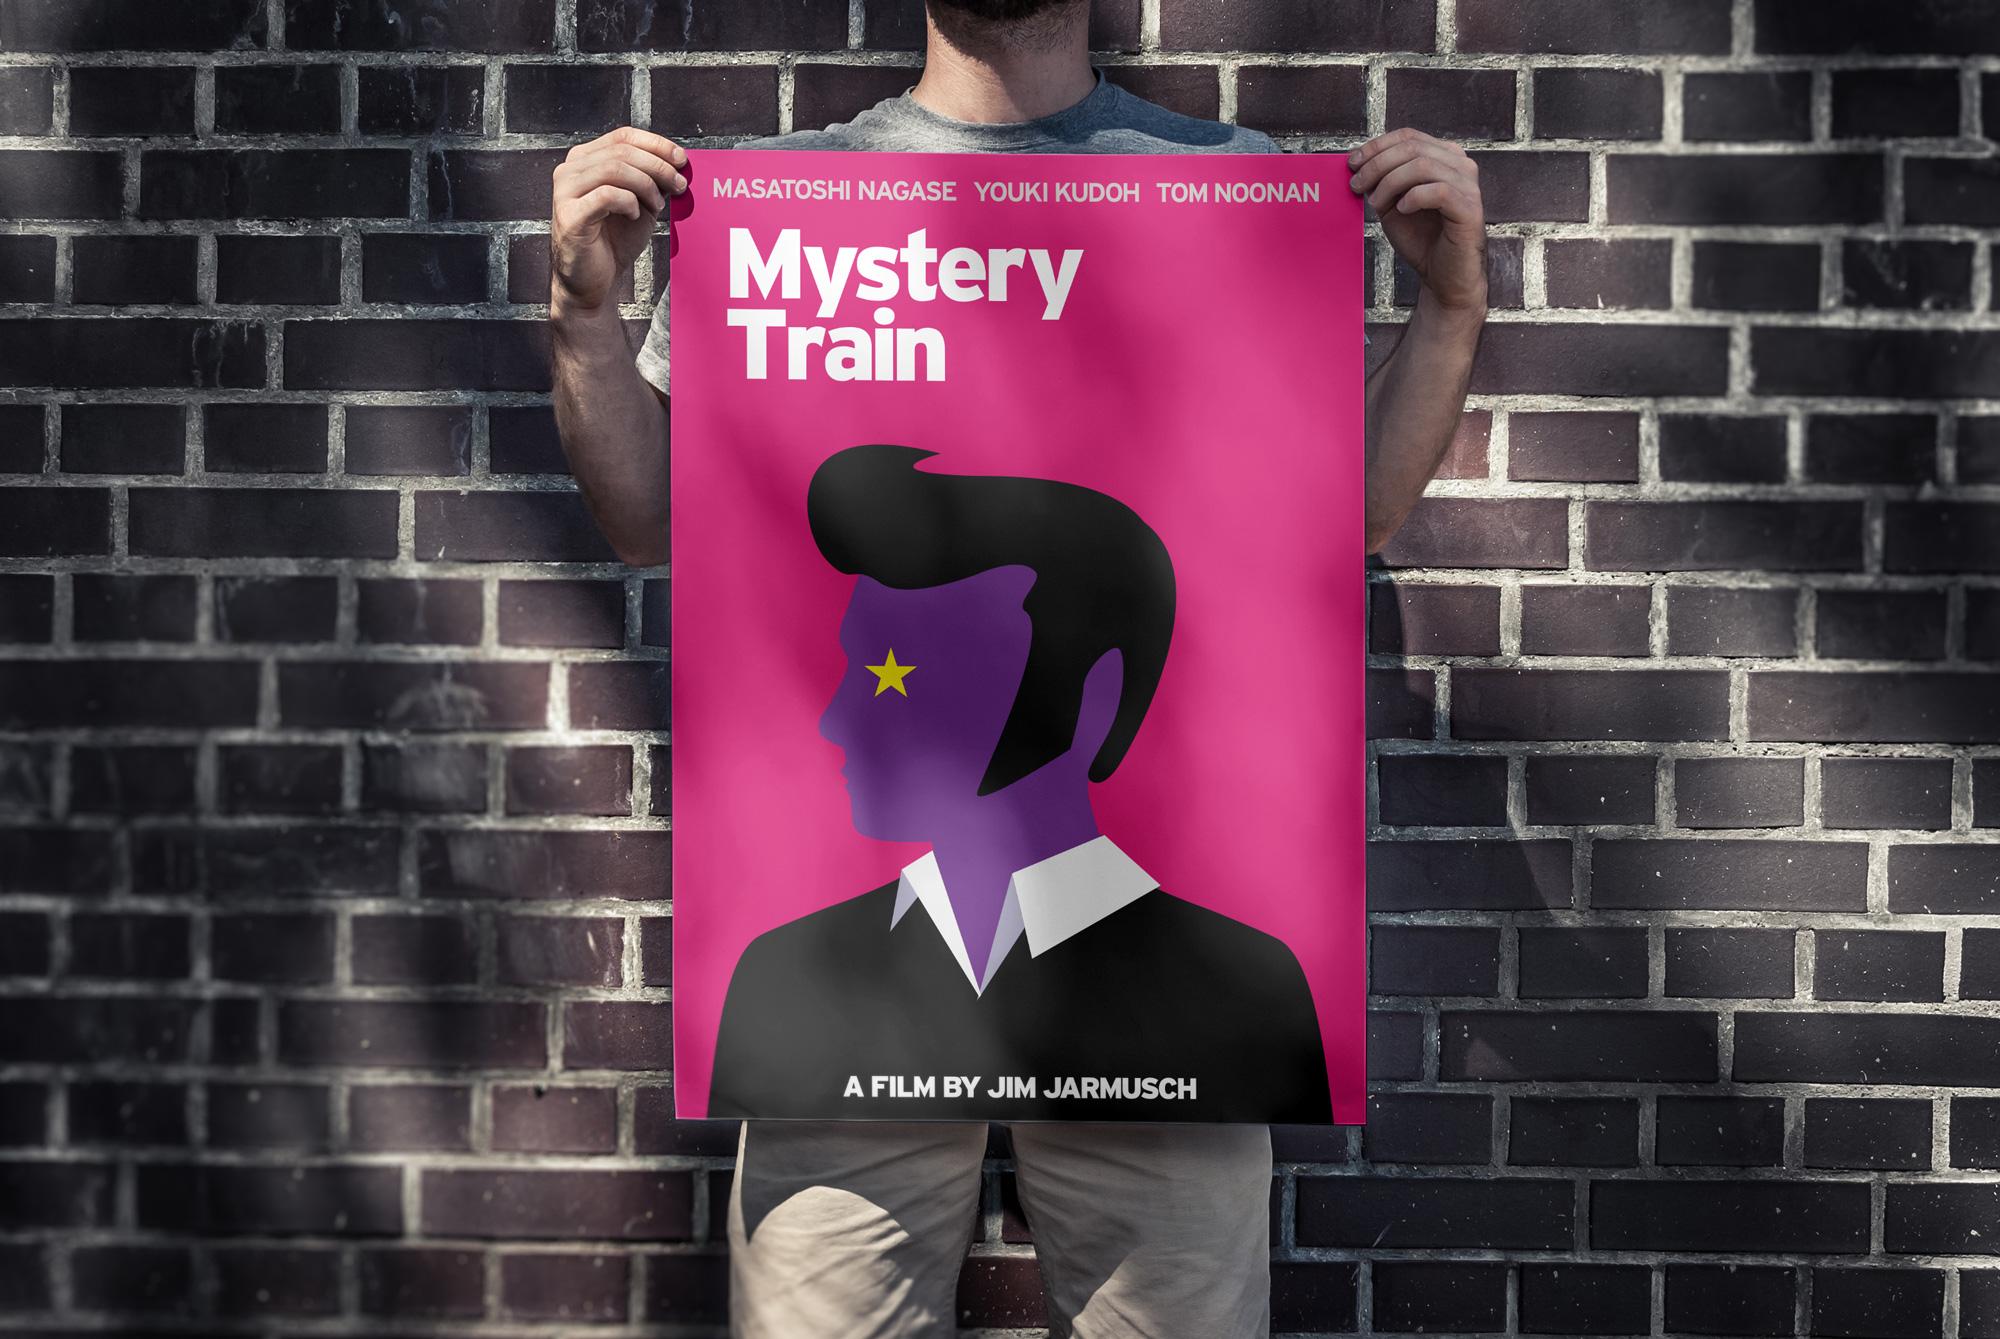 jimjarmuch-posters-07-mystery-train